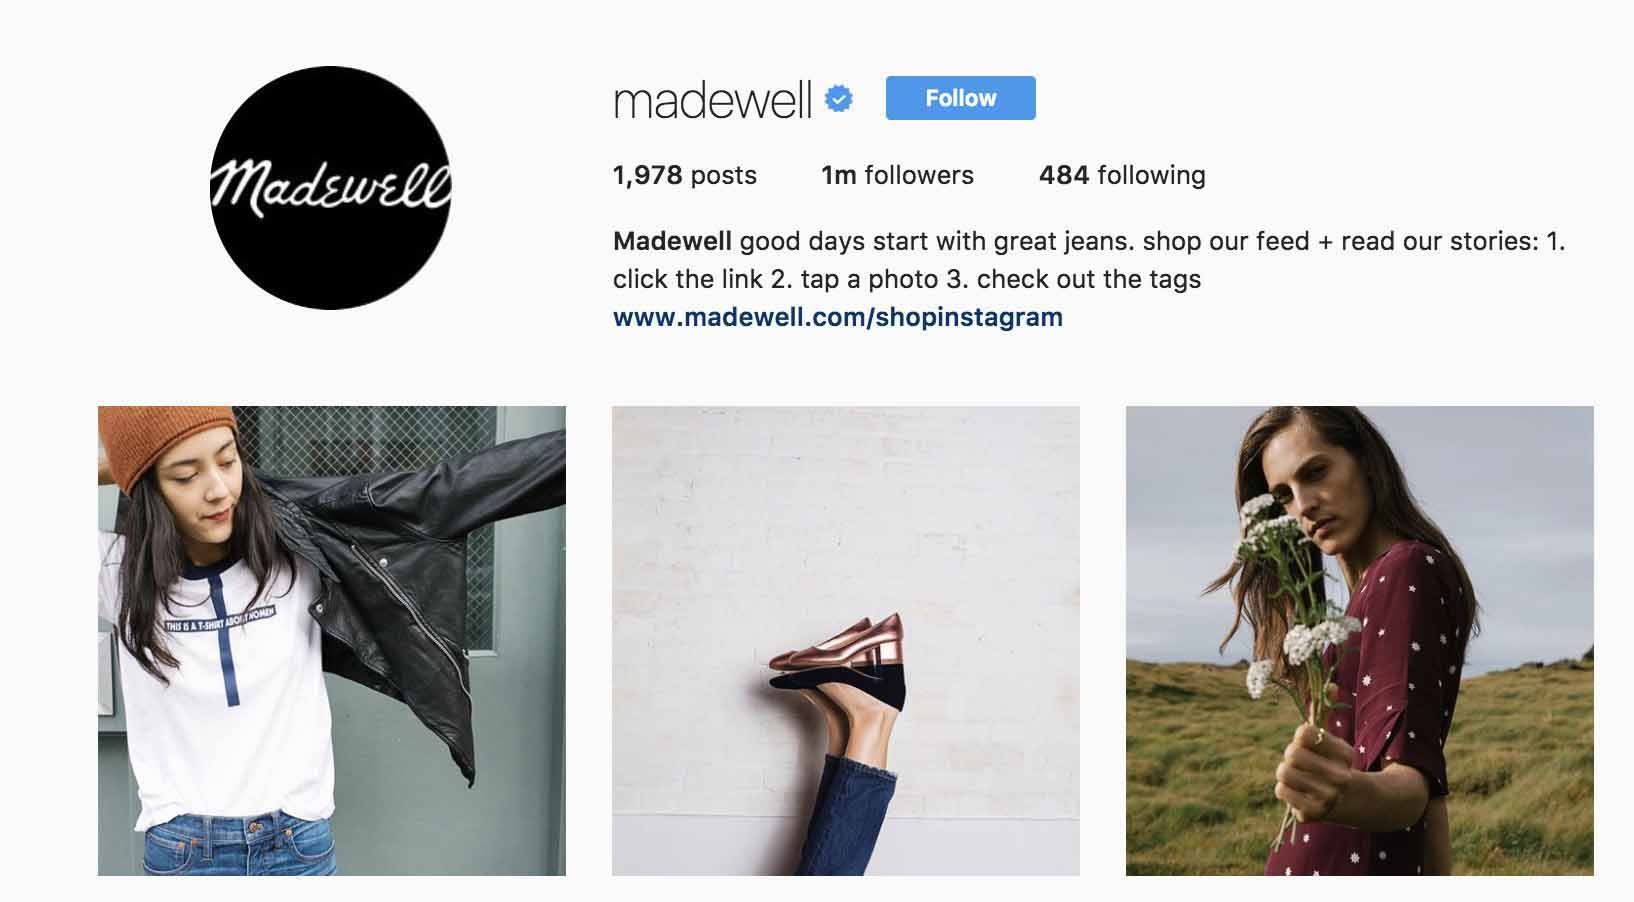 instagram-bio-ideas-madewell